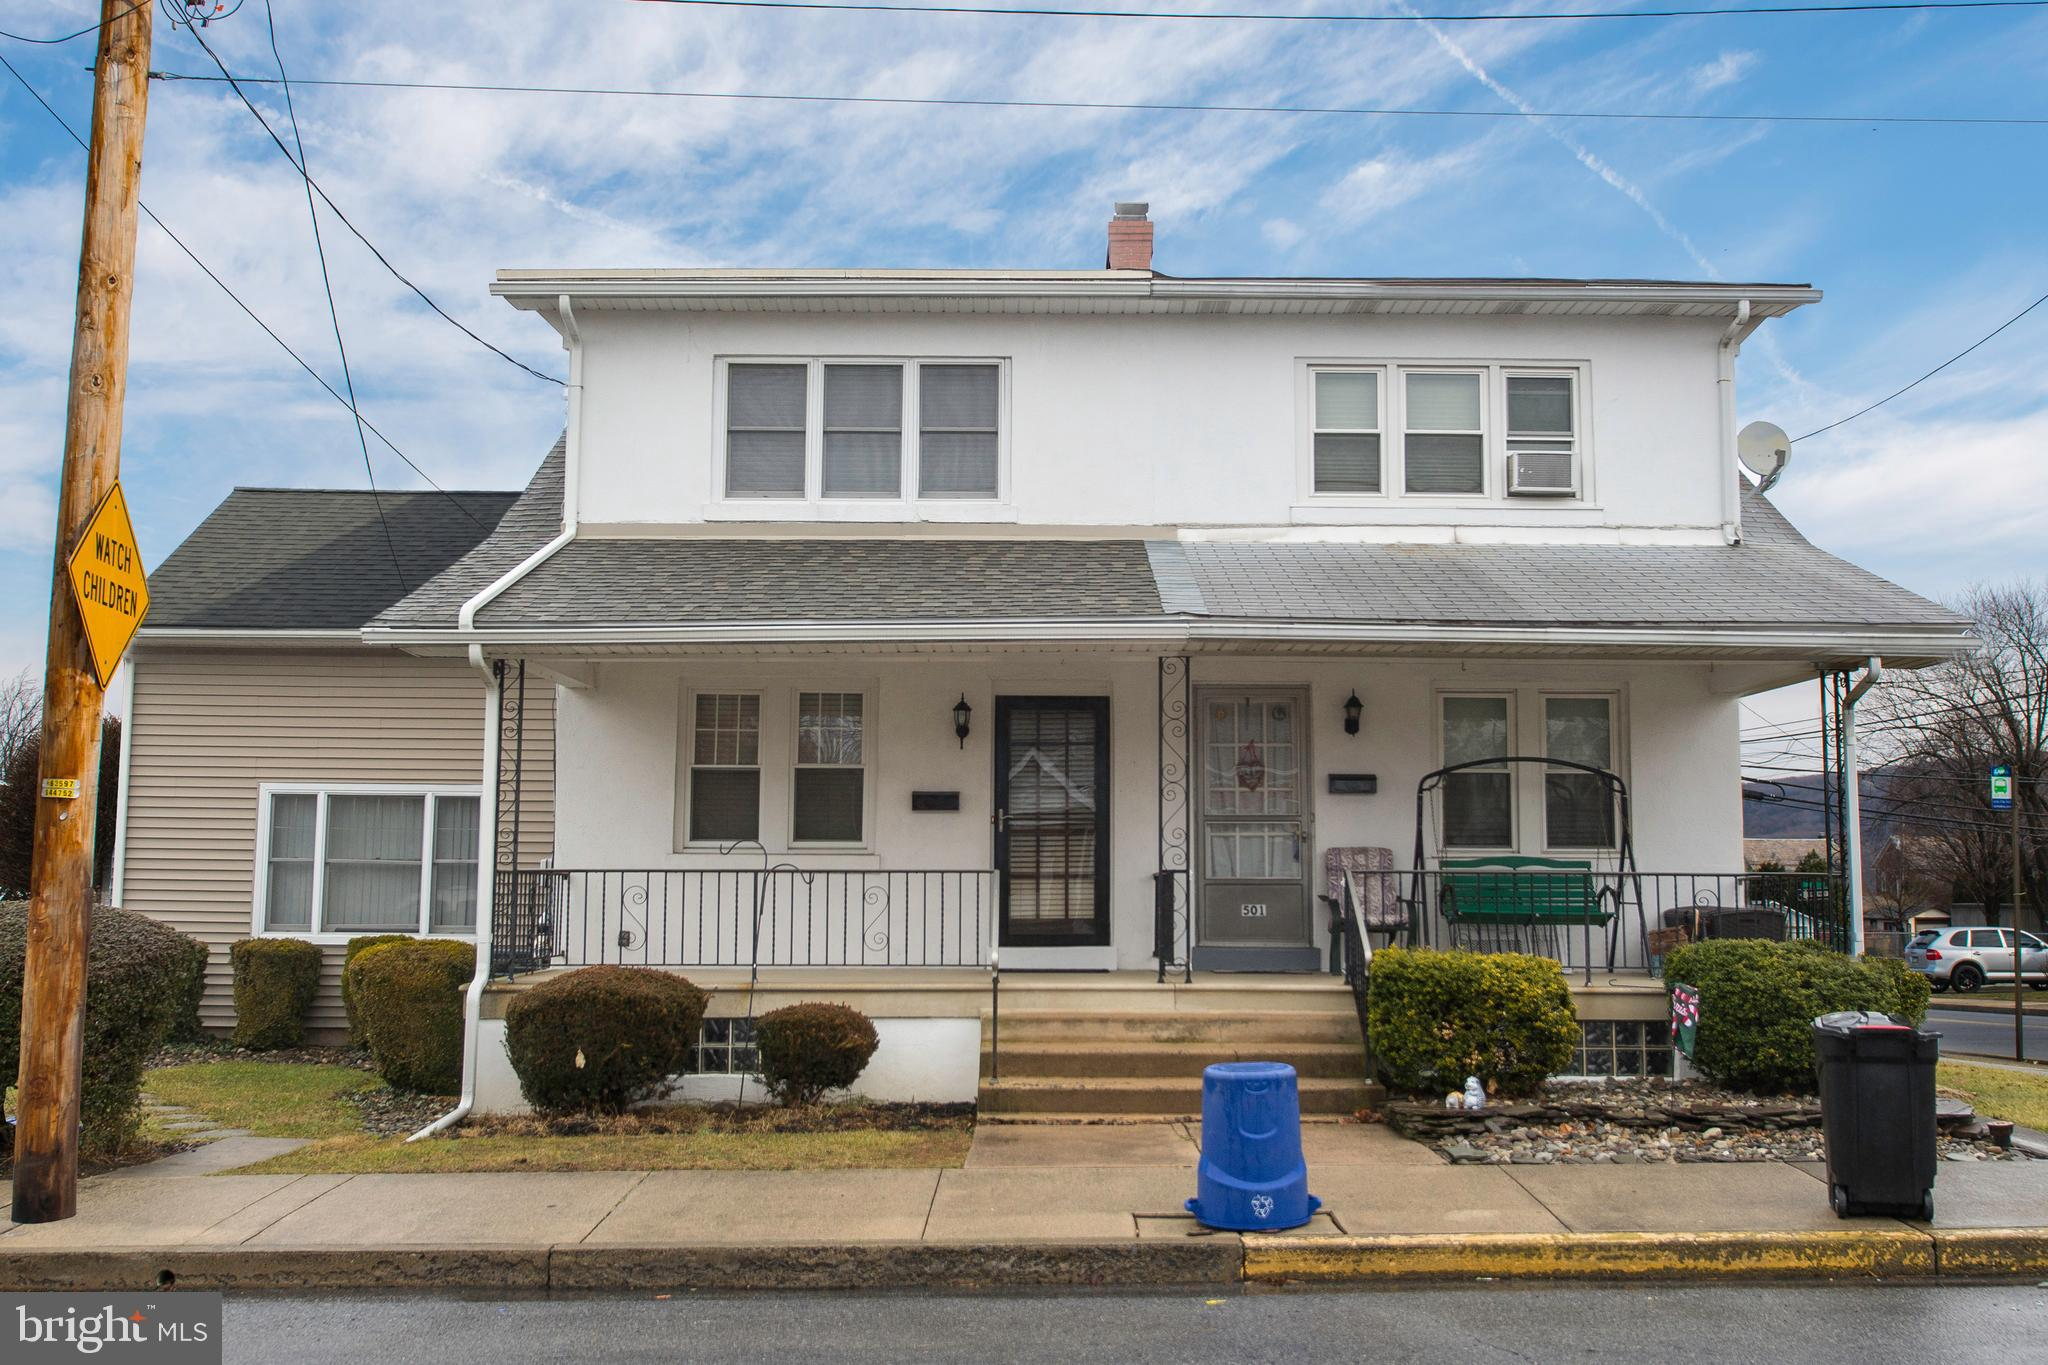 503 3RD STREET N, EMMAUS, PA 18049